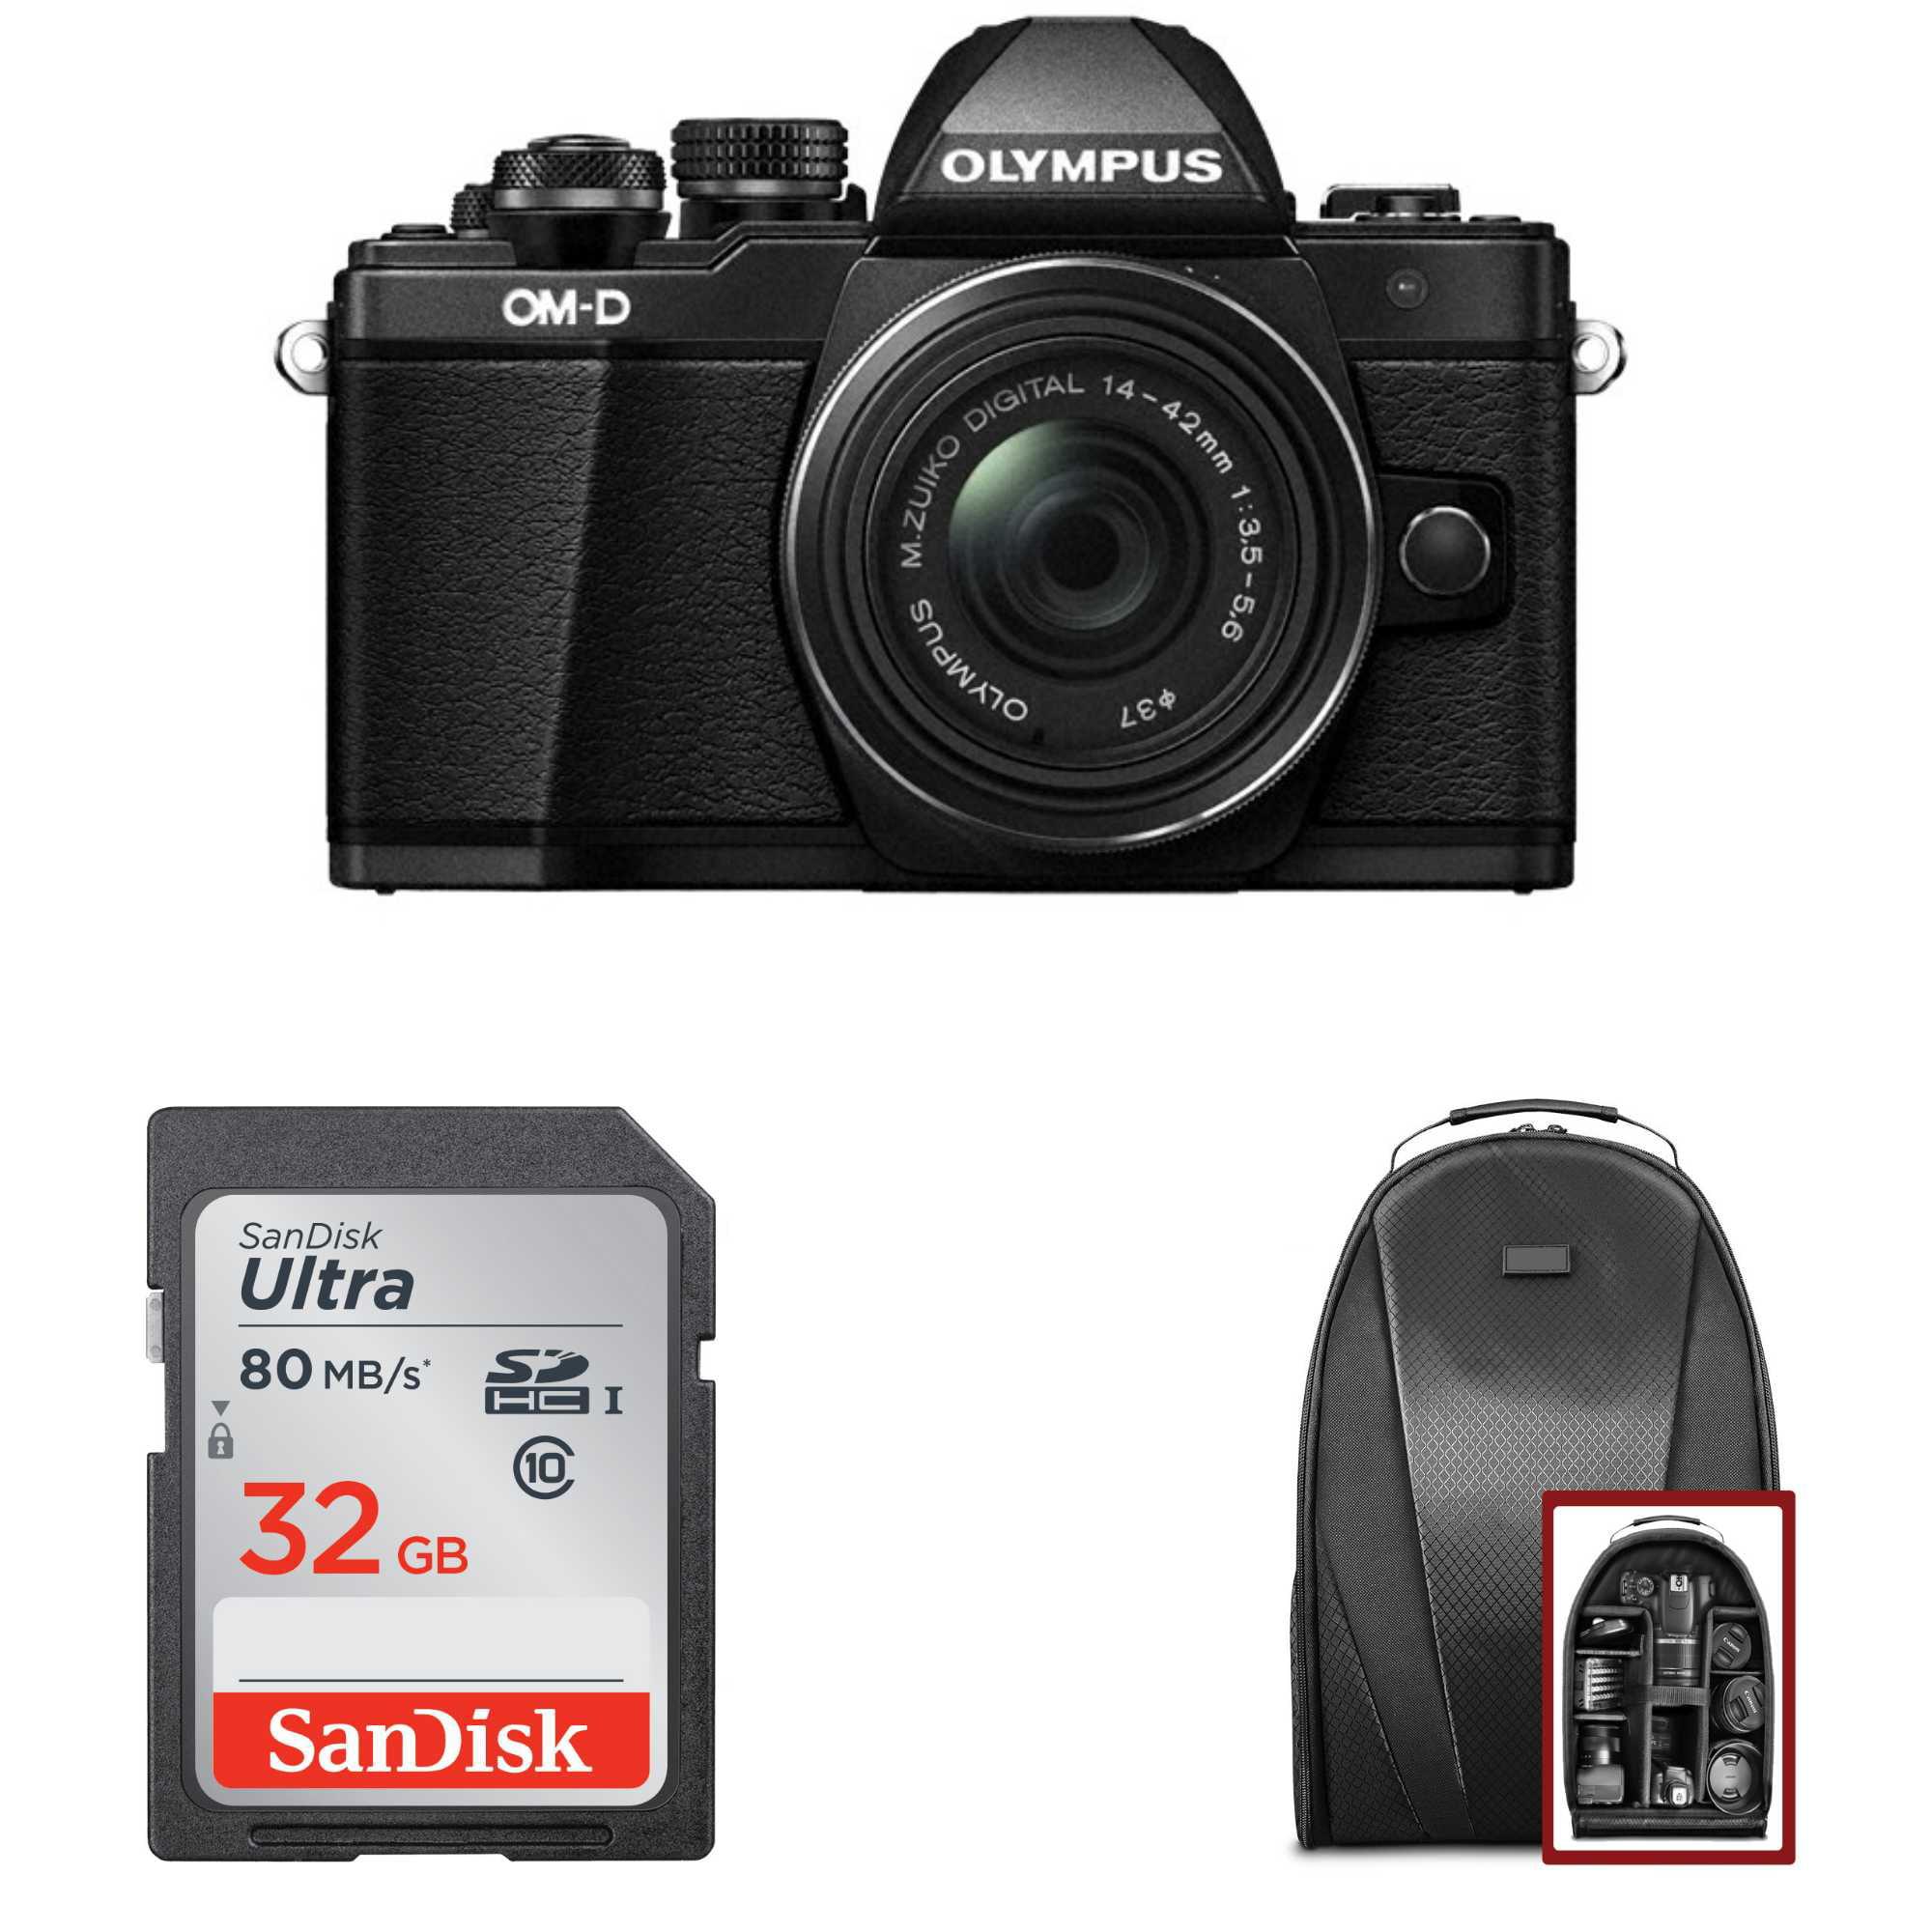 Olympus OM-D E-M10 Mark II Camera w/ M.Zuiko Digital ED 14-42mm EZ Lens (Black) + 32GB Card + Backpack